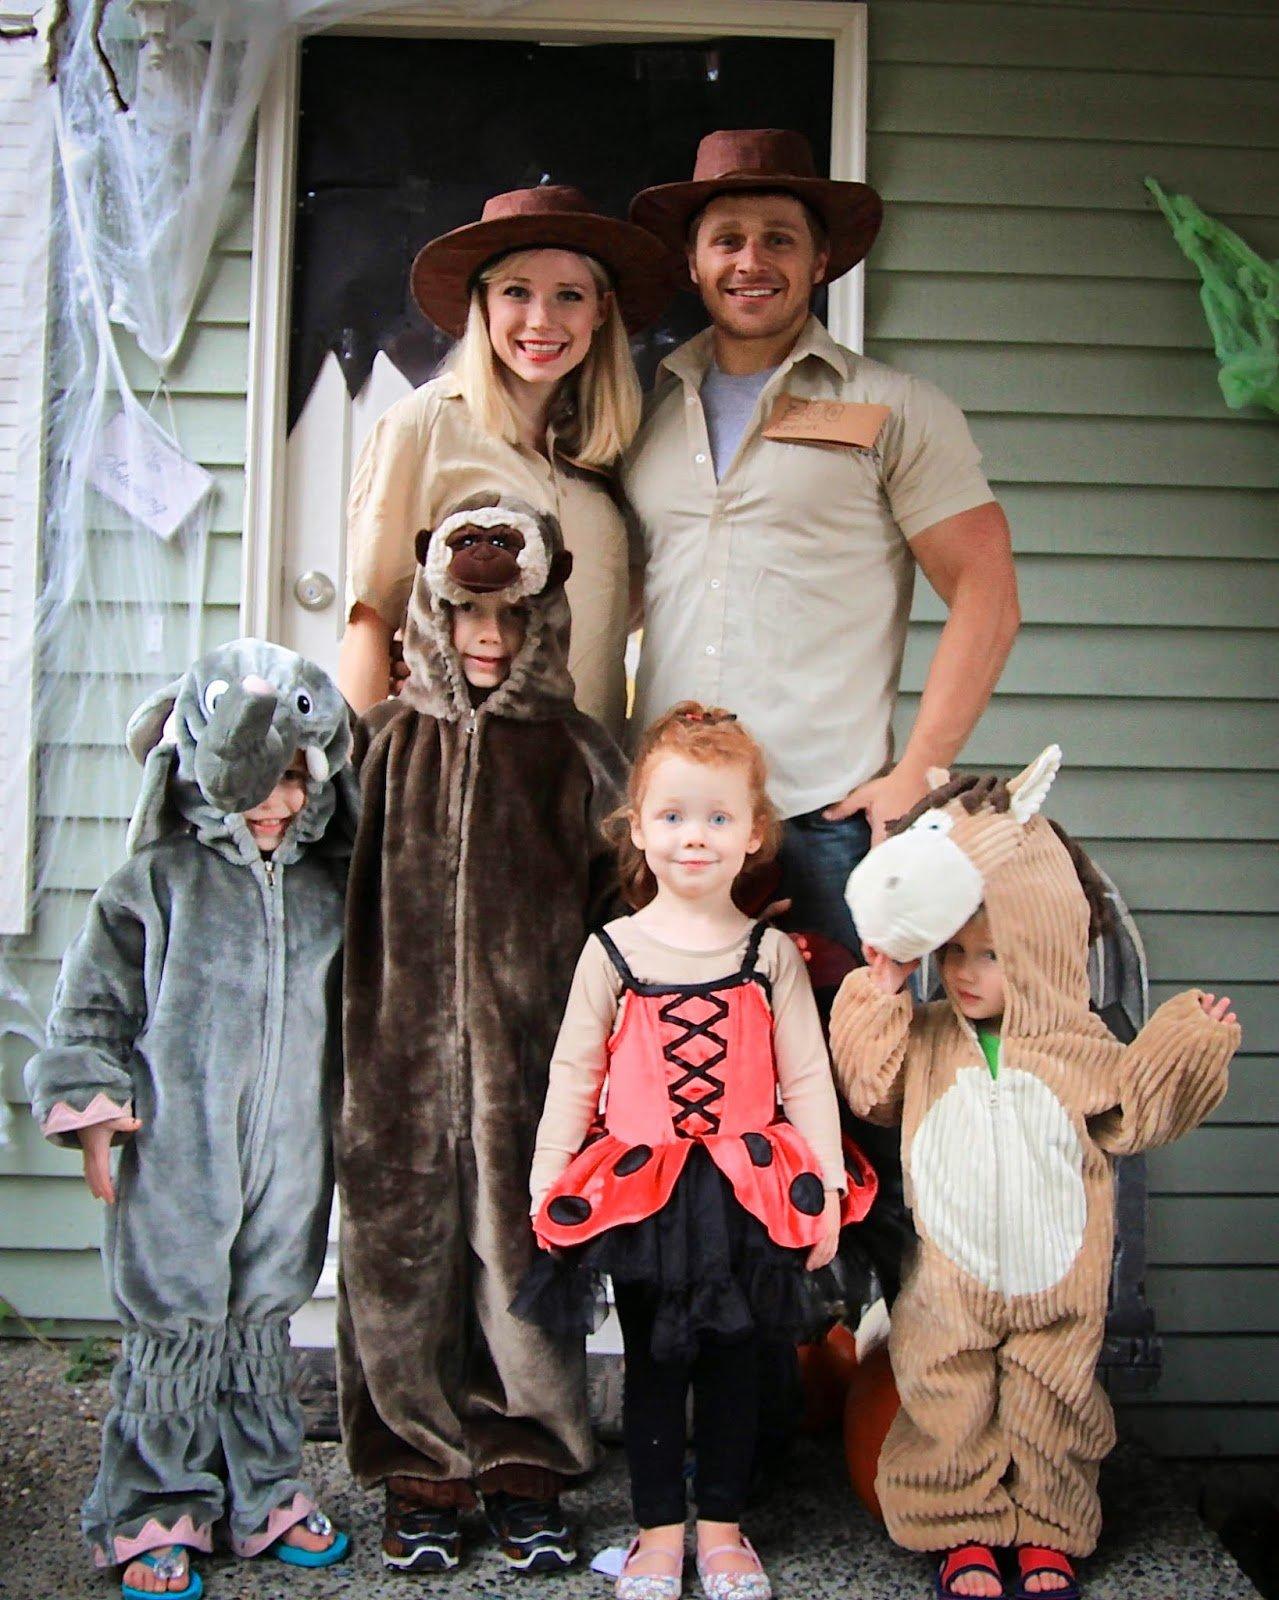 remodelaholic | 25 creative family halloween costume ideas